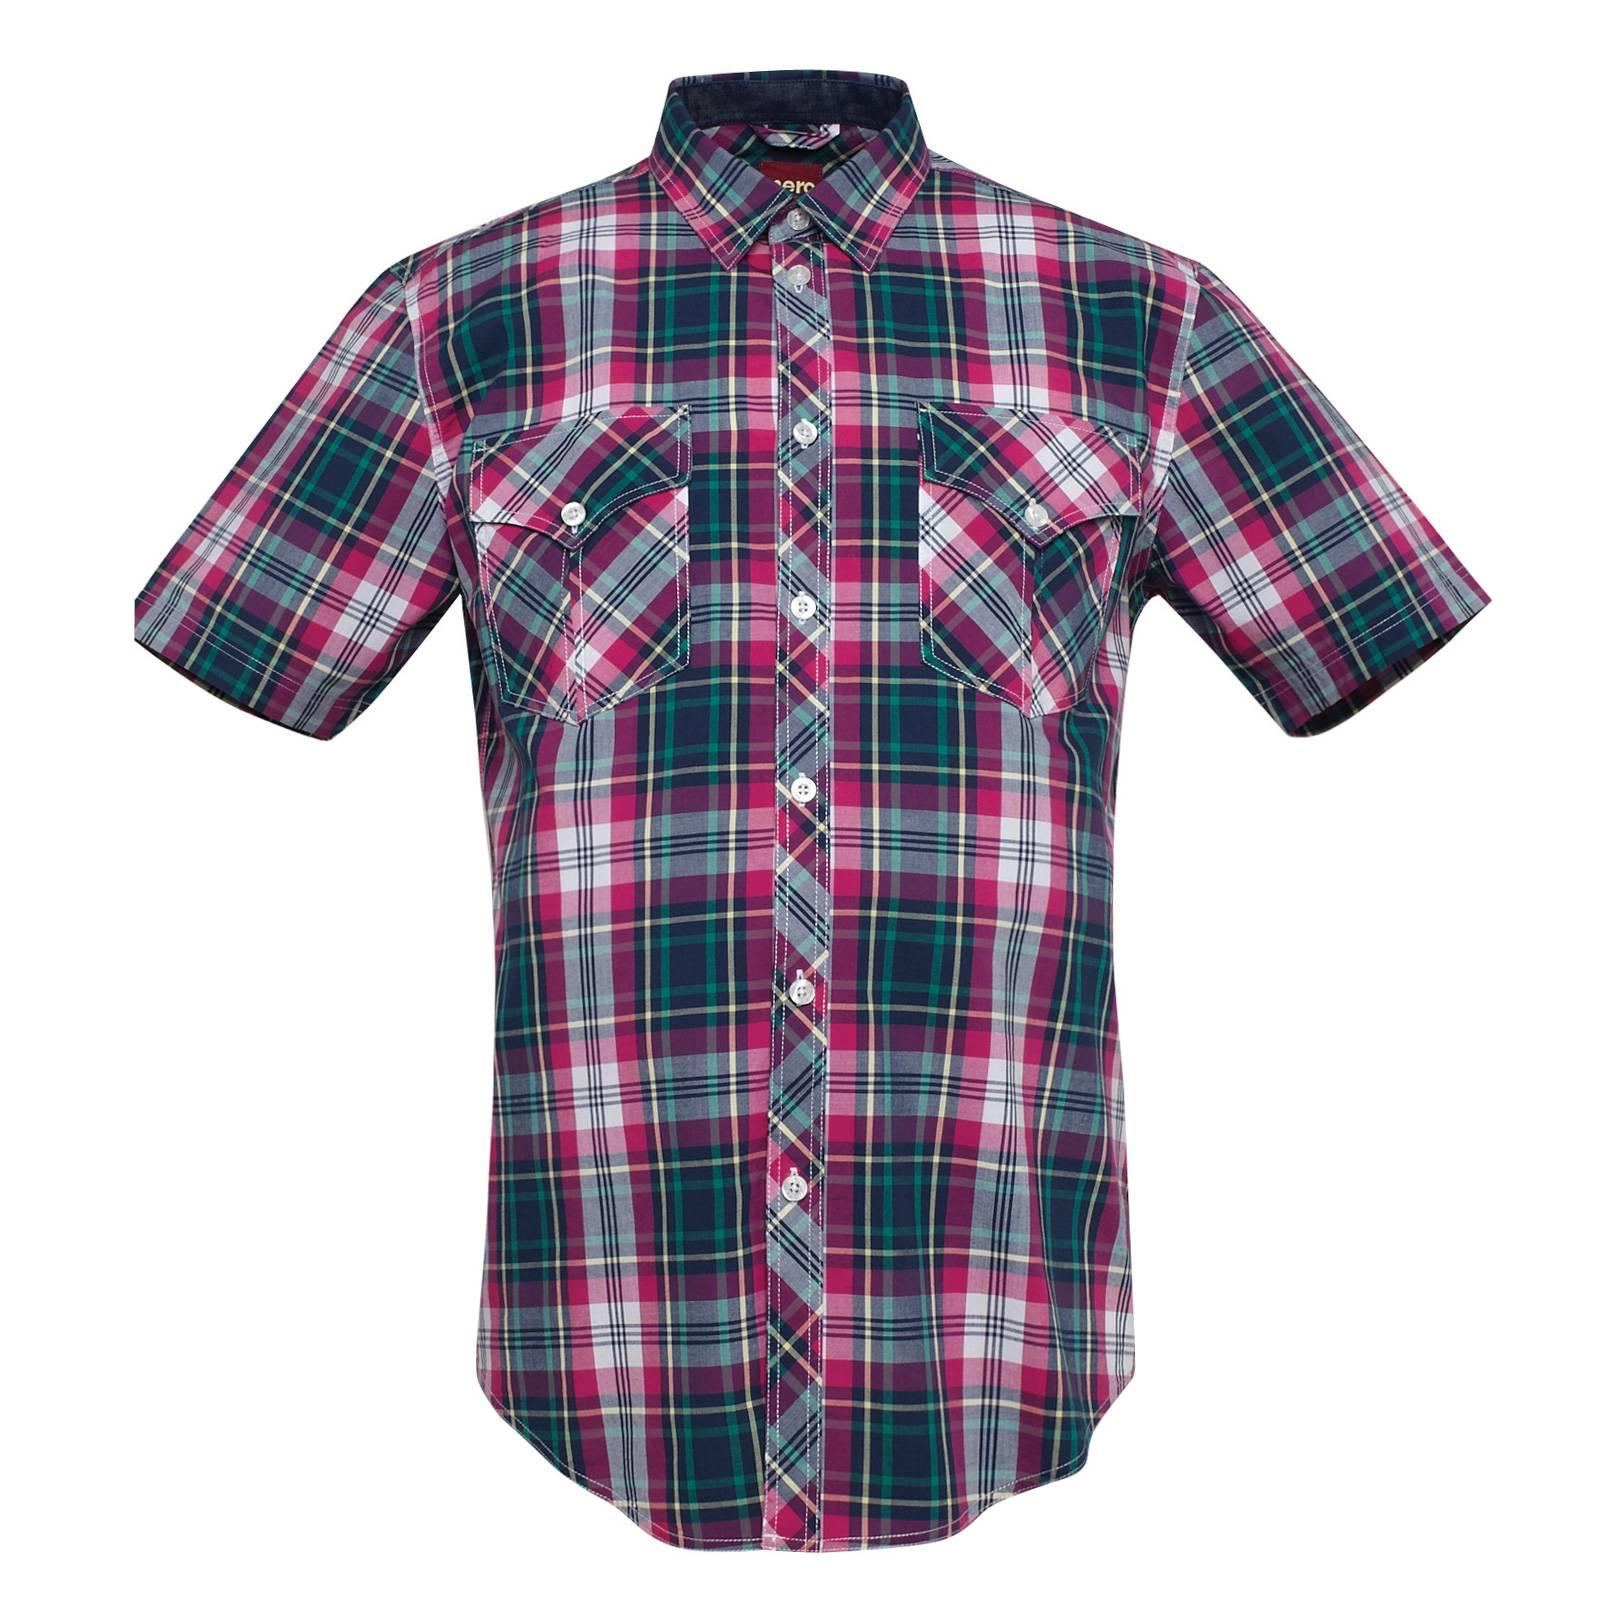 Рубашка GrahamРубашки<br><br><br>Артикул: 1512112<br>Материал: 100% хлопок<br>Цвет: розовый<br>Пол: Мужской